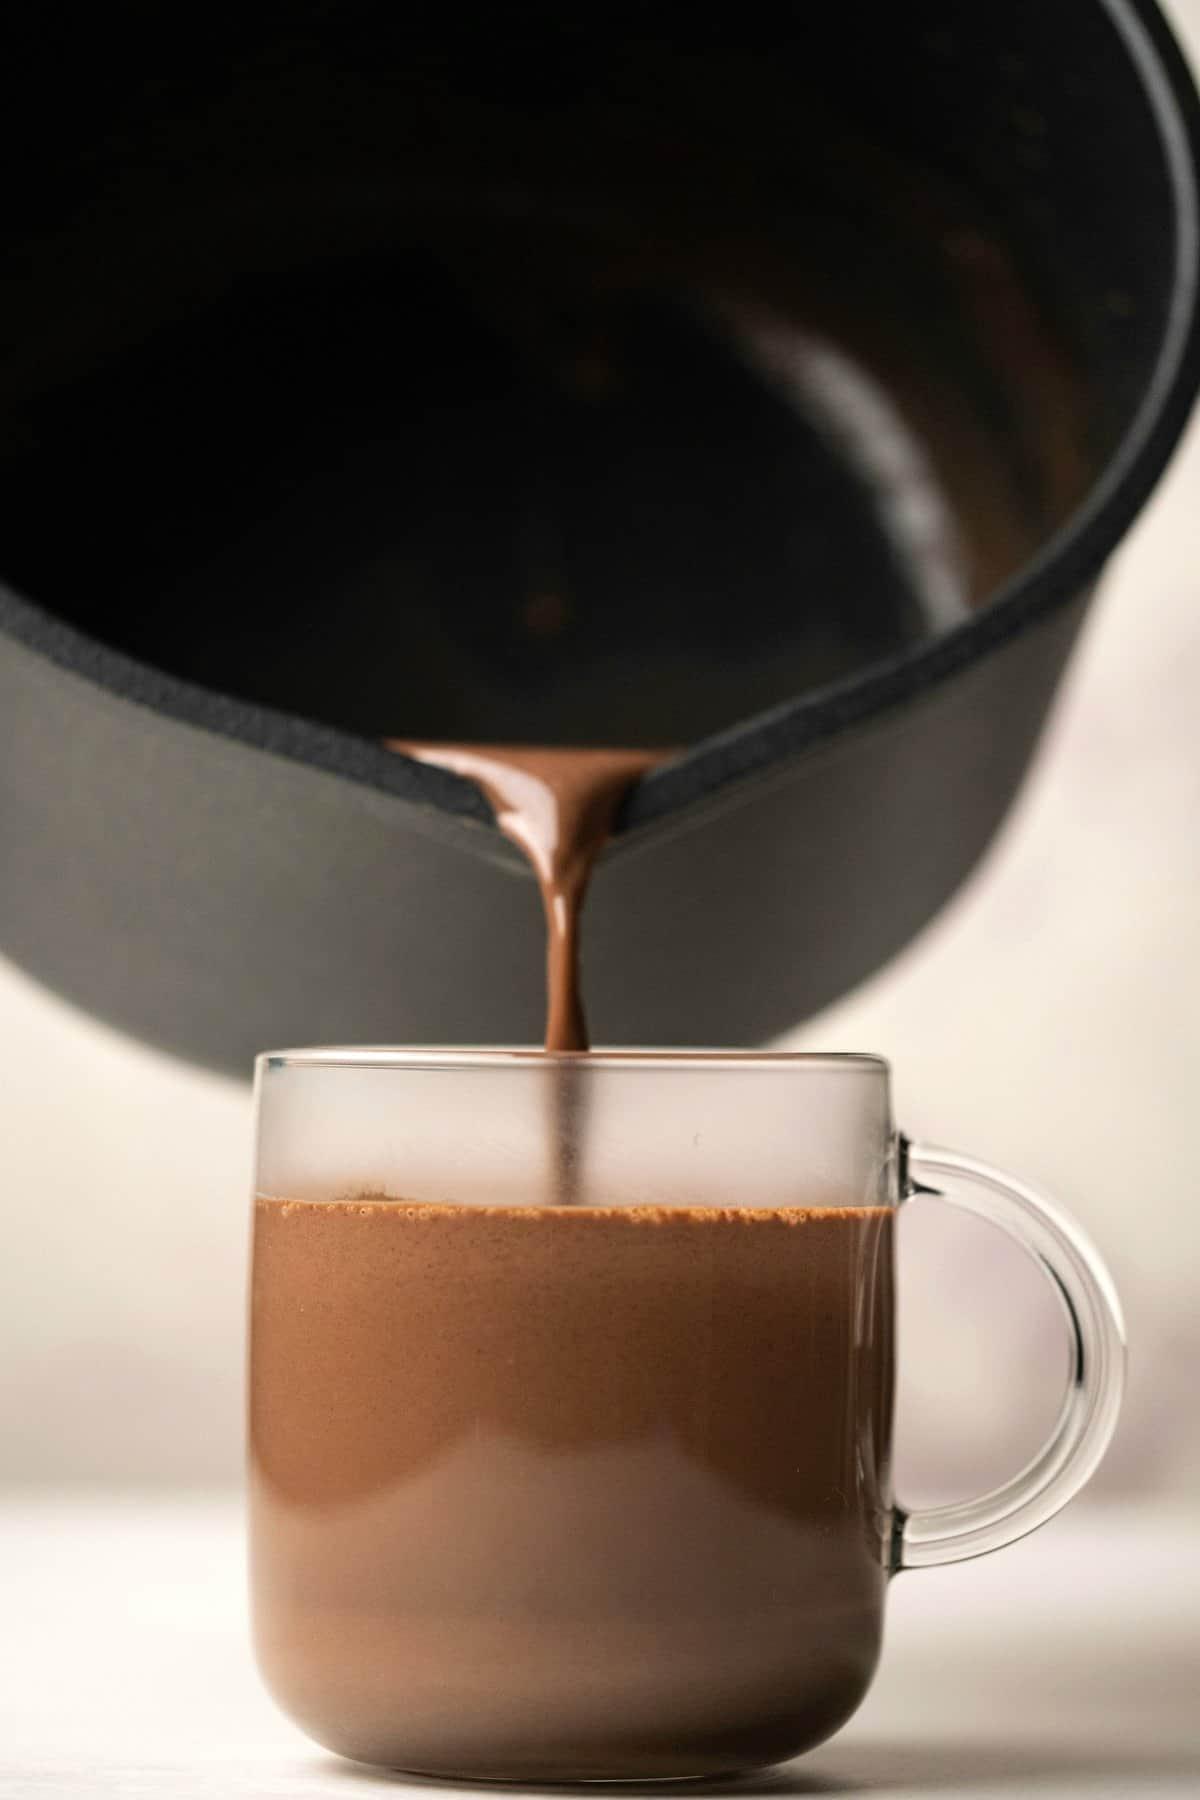 Hot chocolate pouring into a glass mug.